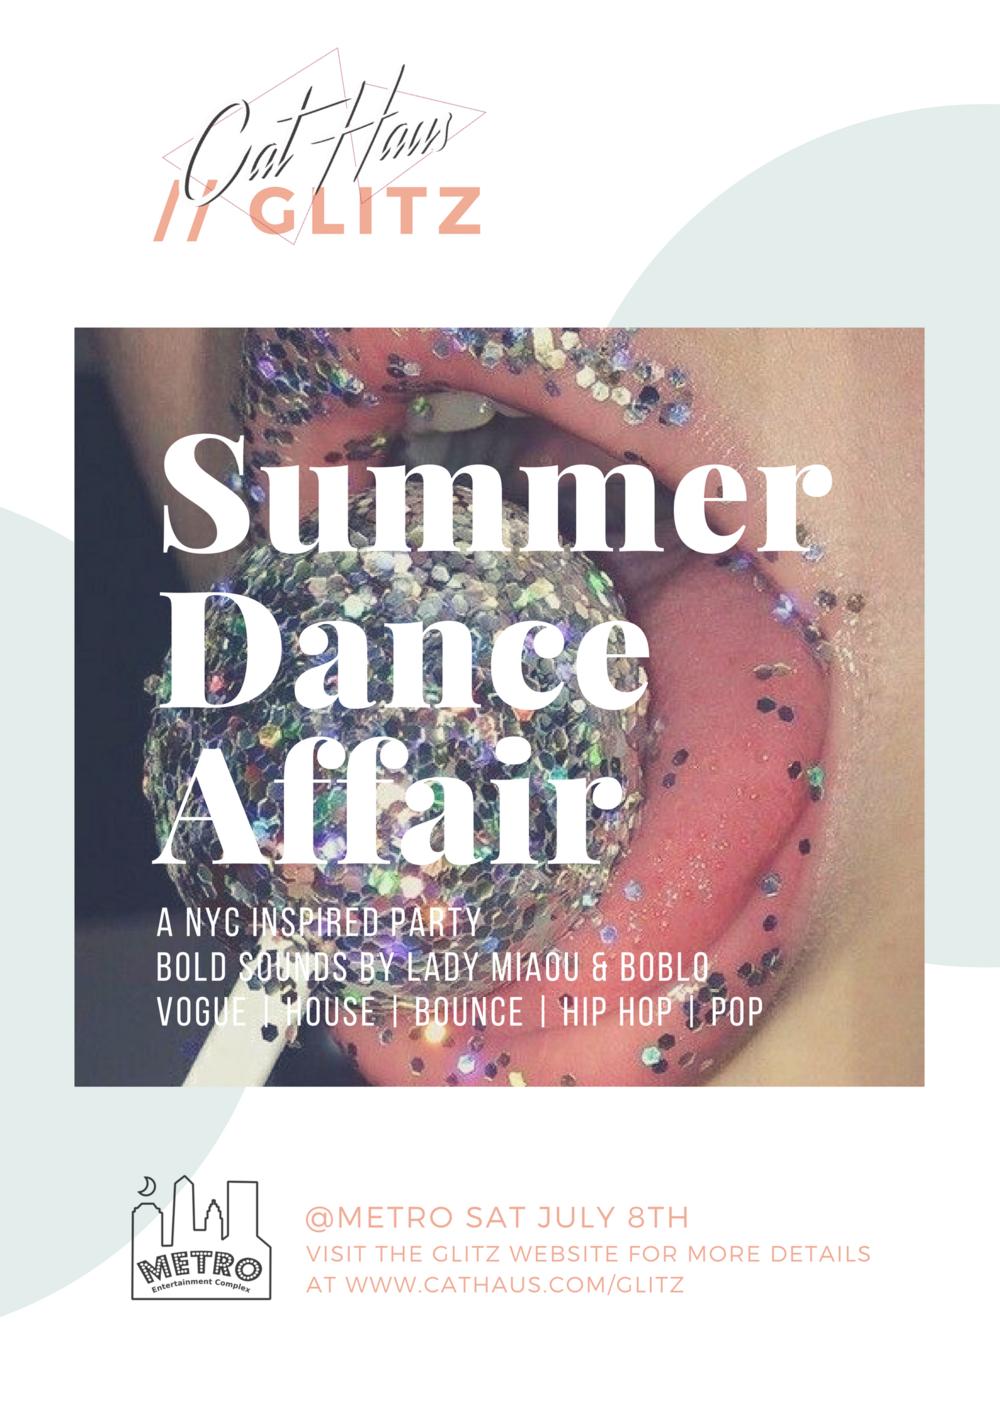 summerdance party.png